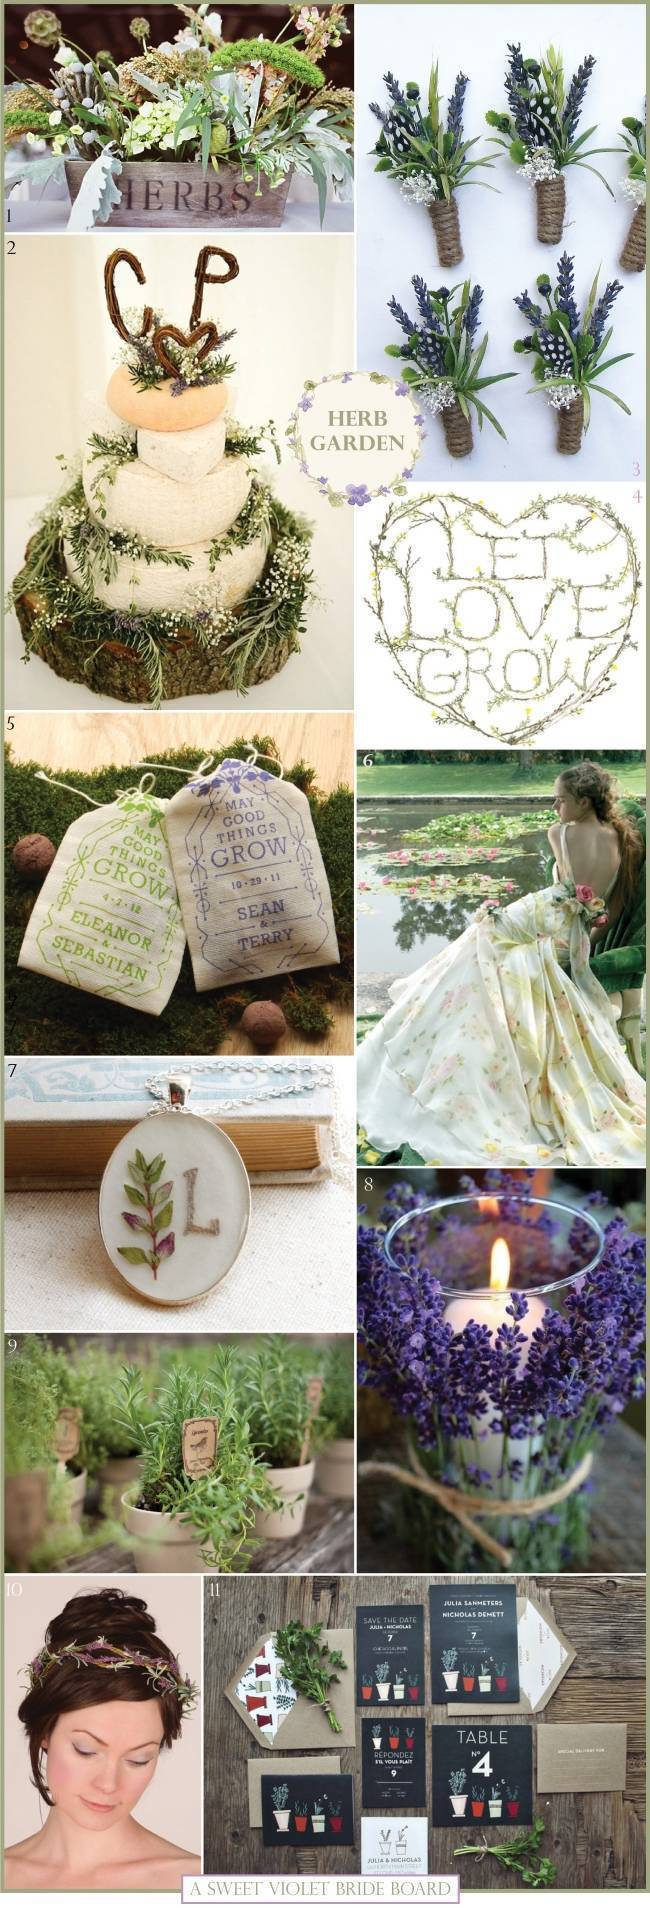 Wedding Inspiration Board #7: Herb Garden